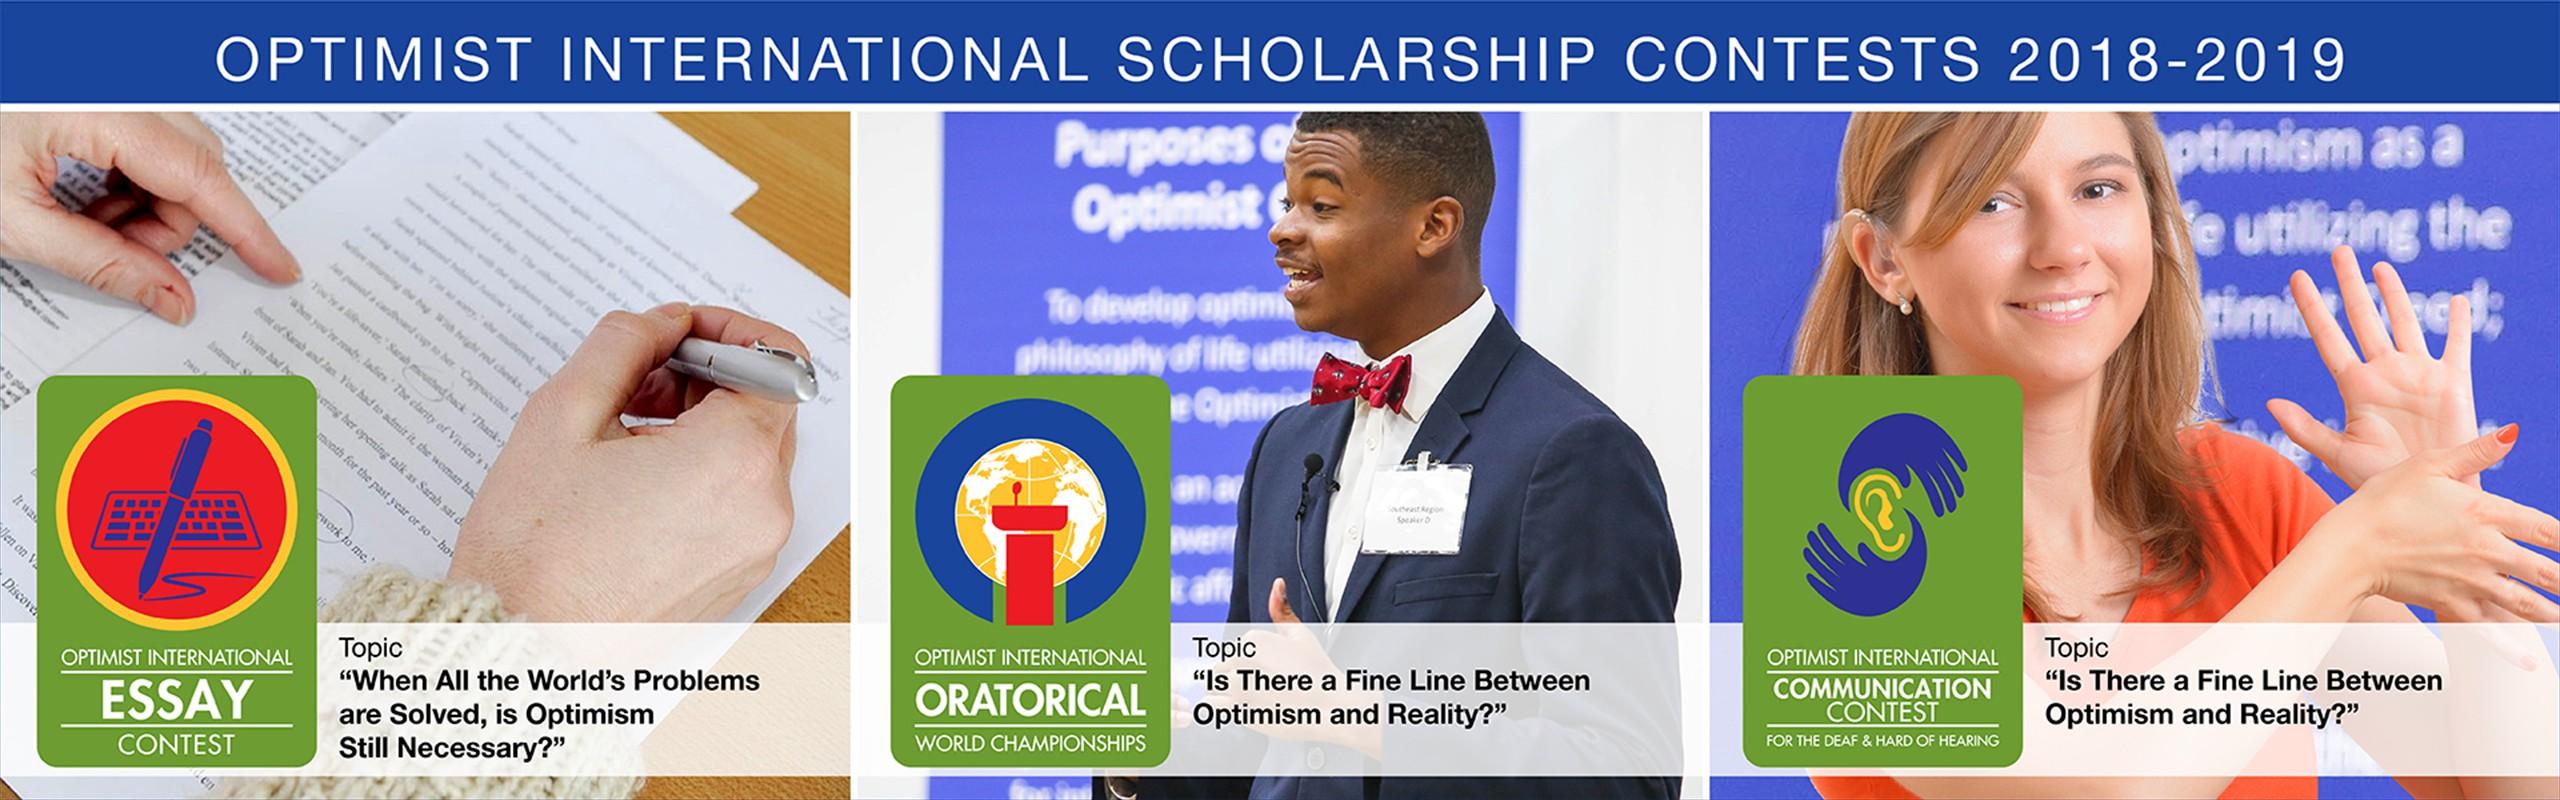 optimist international scholarship essay